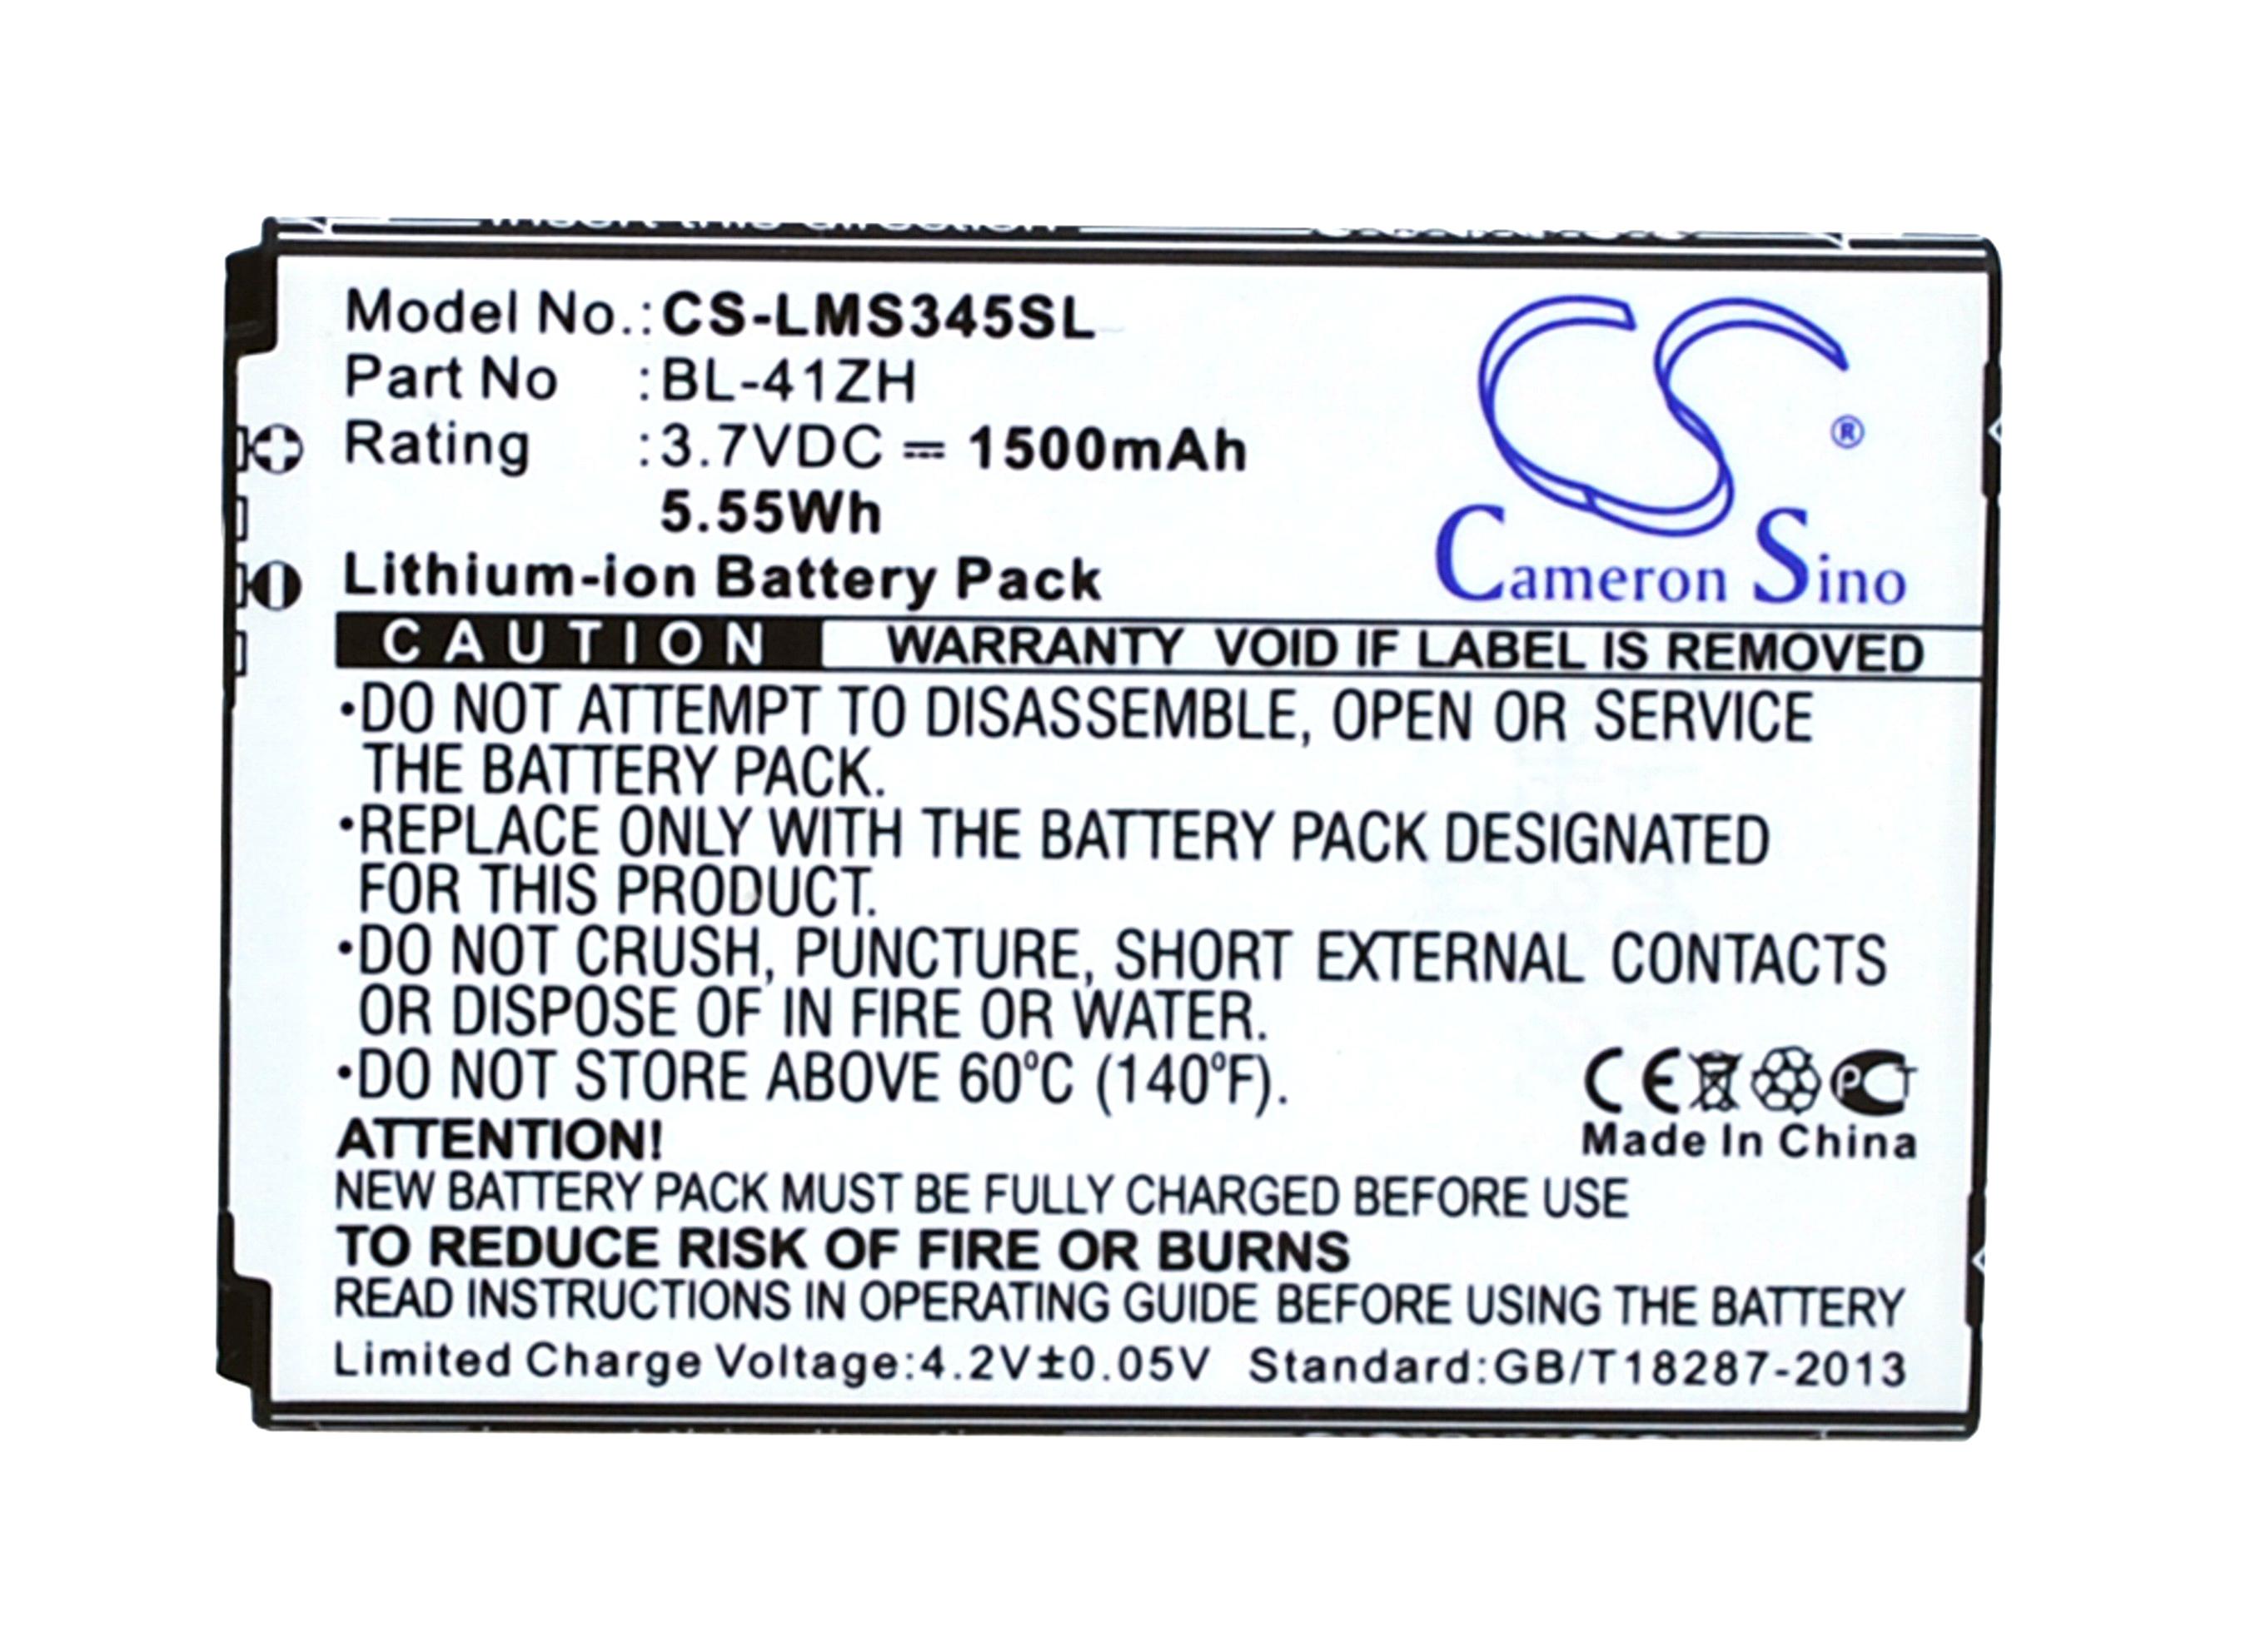 Cameron Sino baterie do mobilů pro LG Leon TV Dual SIM 3.7V Li-ion 1500mAh černá - neoriginální